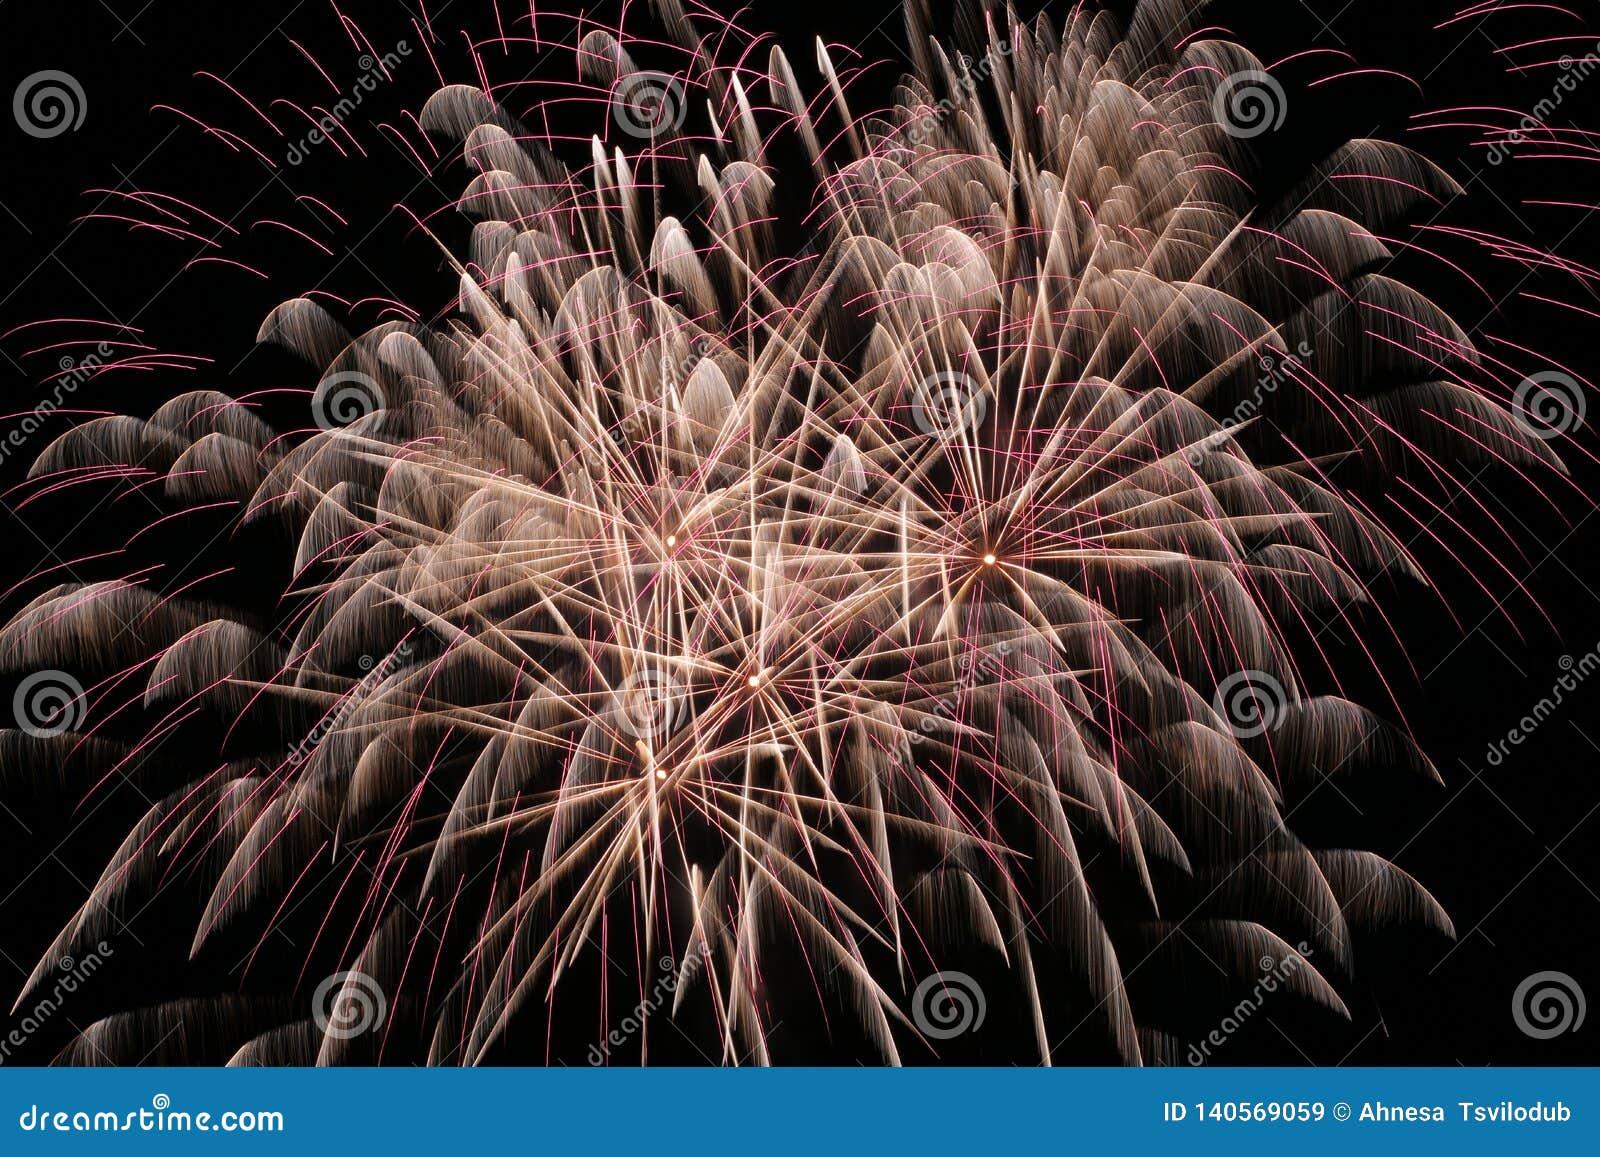 Feuerwerke im Himmel